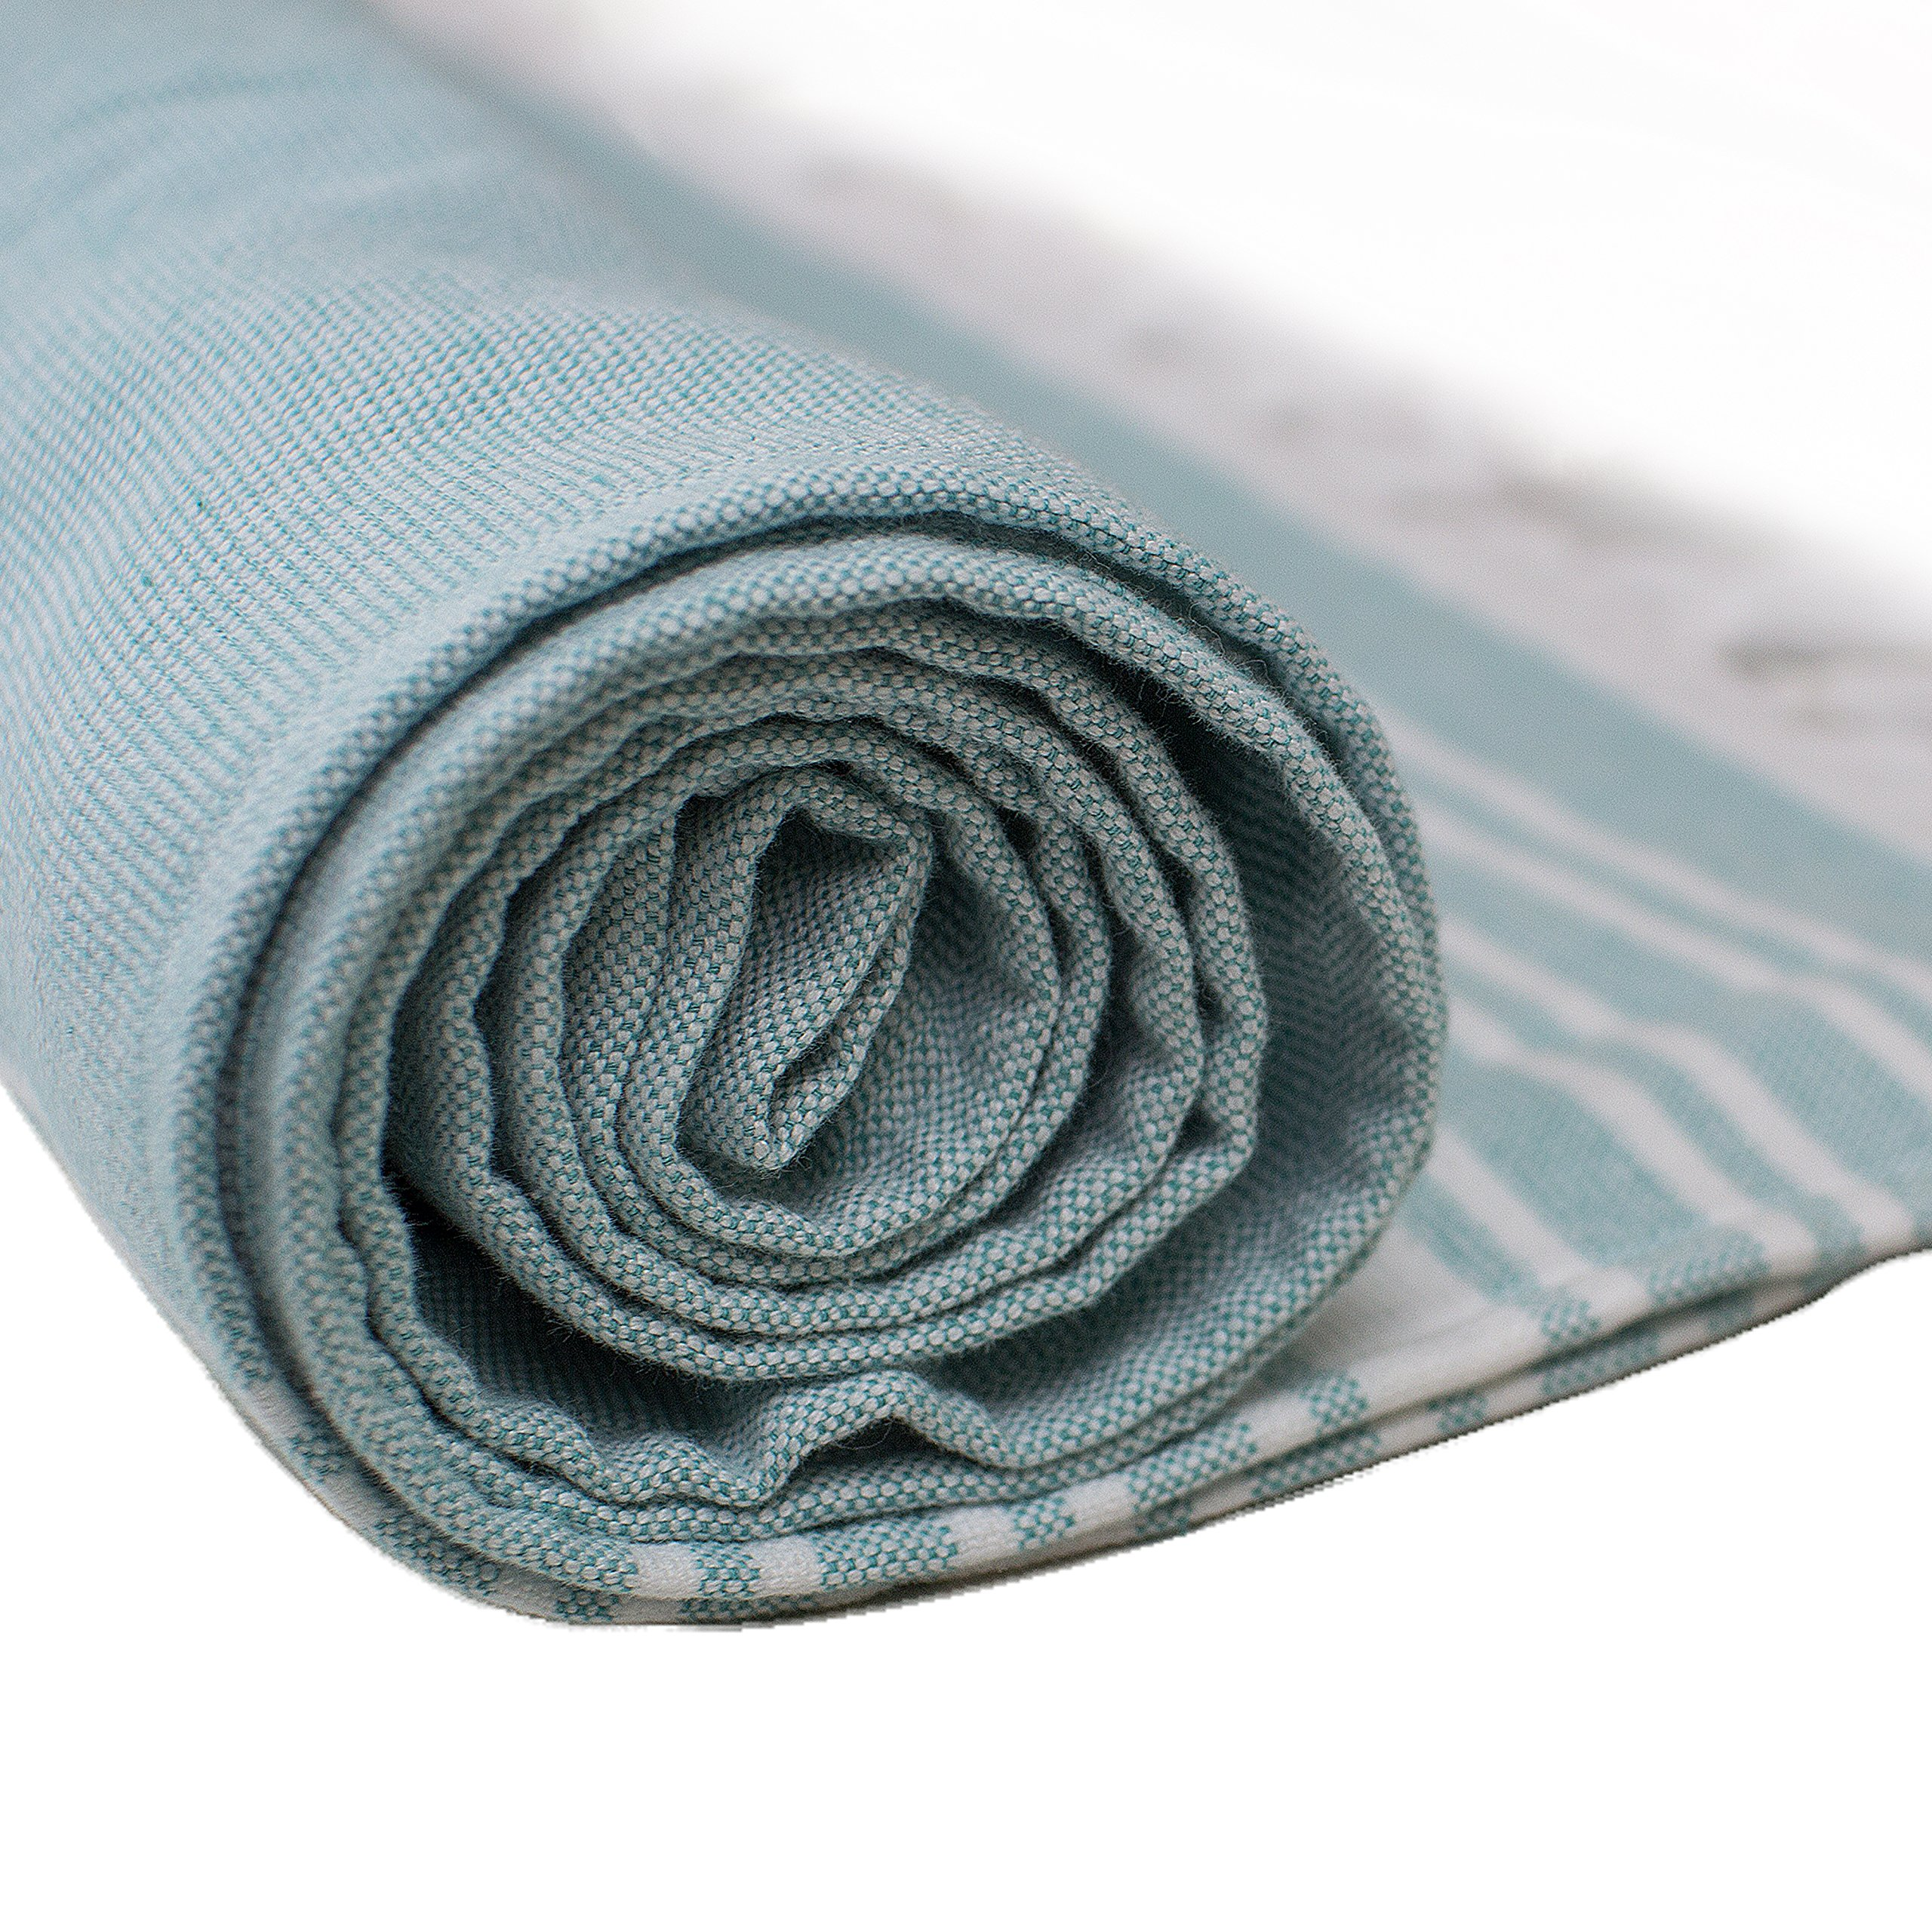 Caravalli Turkish Peshtemal Bath Sheet, York Green OverSized Cotton Flat Towel for Bathroom, Turkish Hamam Large Woven Cotton Beach Towel with Fringe, 35 x 70 XL Luxury Green Peshtamal Towel